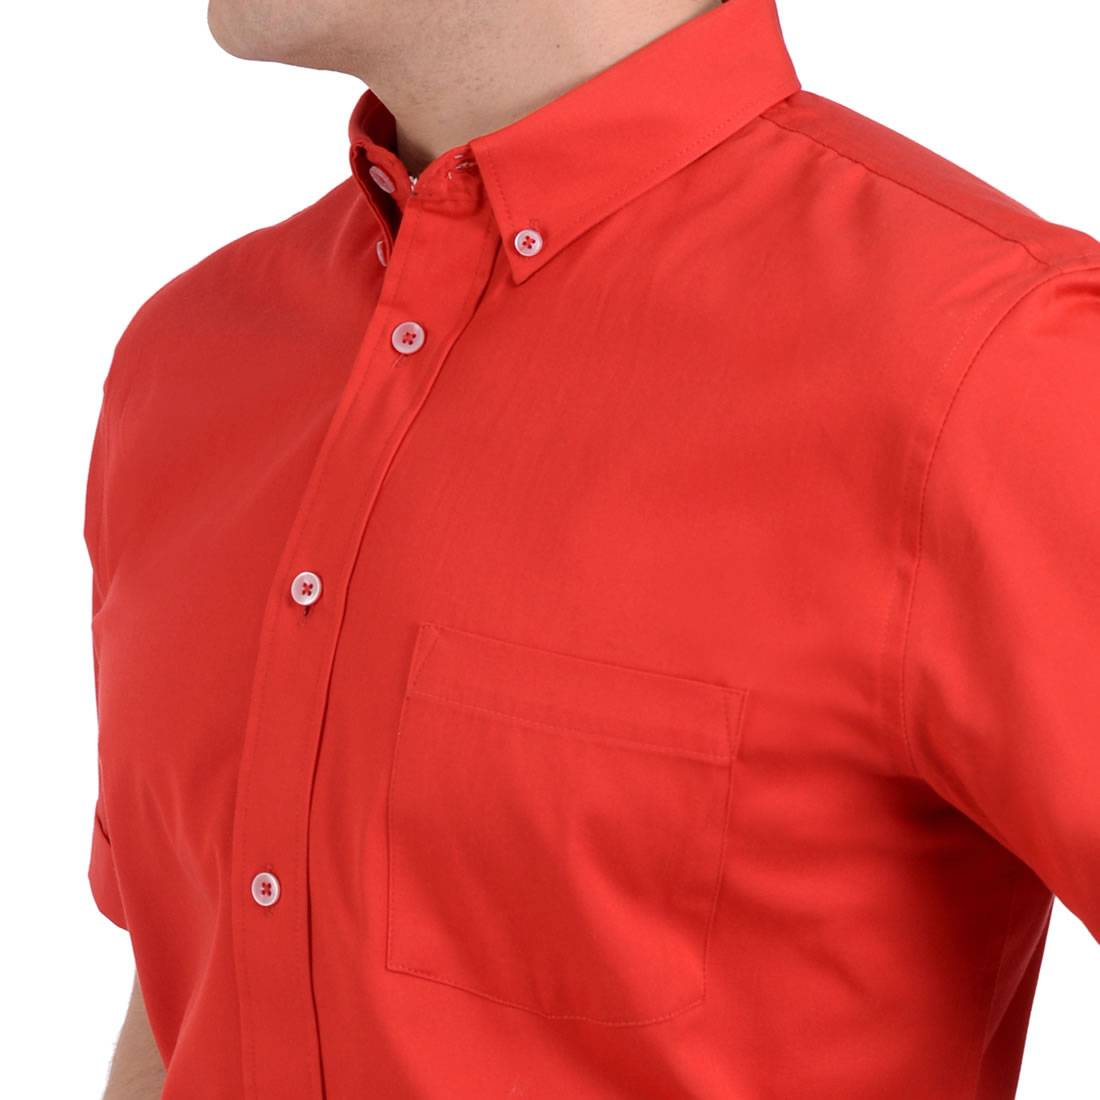 042331381731-04-Camisa-Manga-Corta-classic-Fit-Rojo-yale